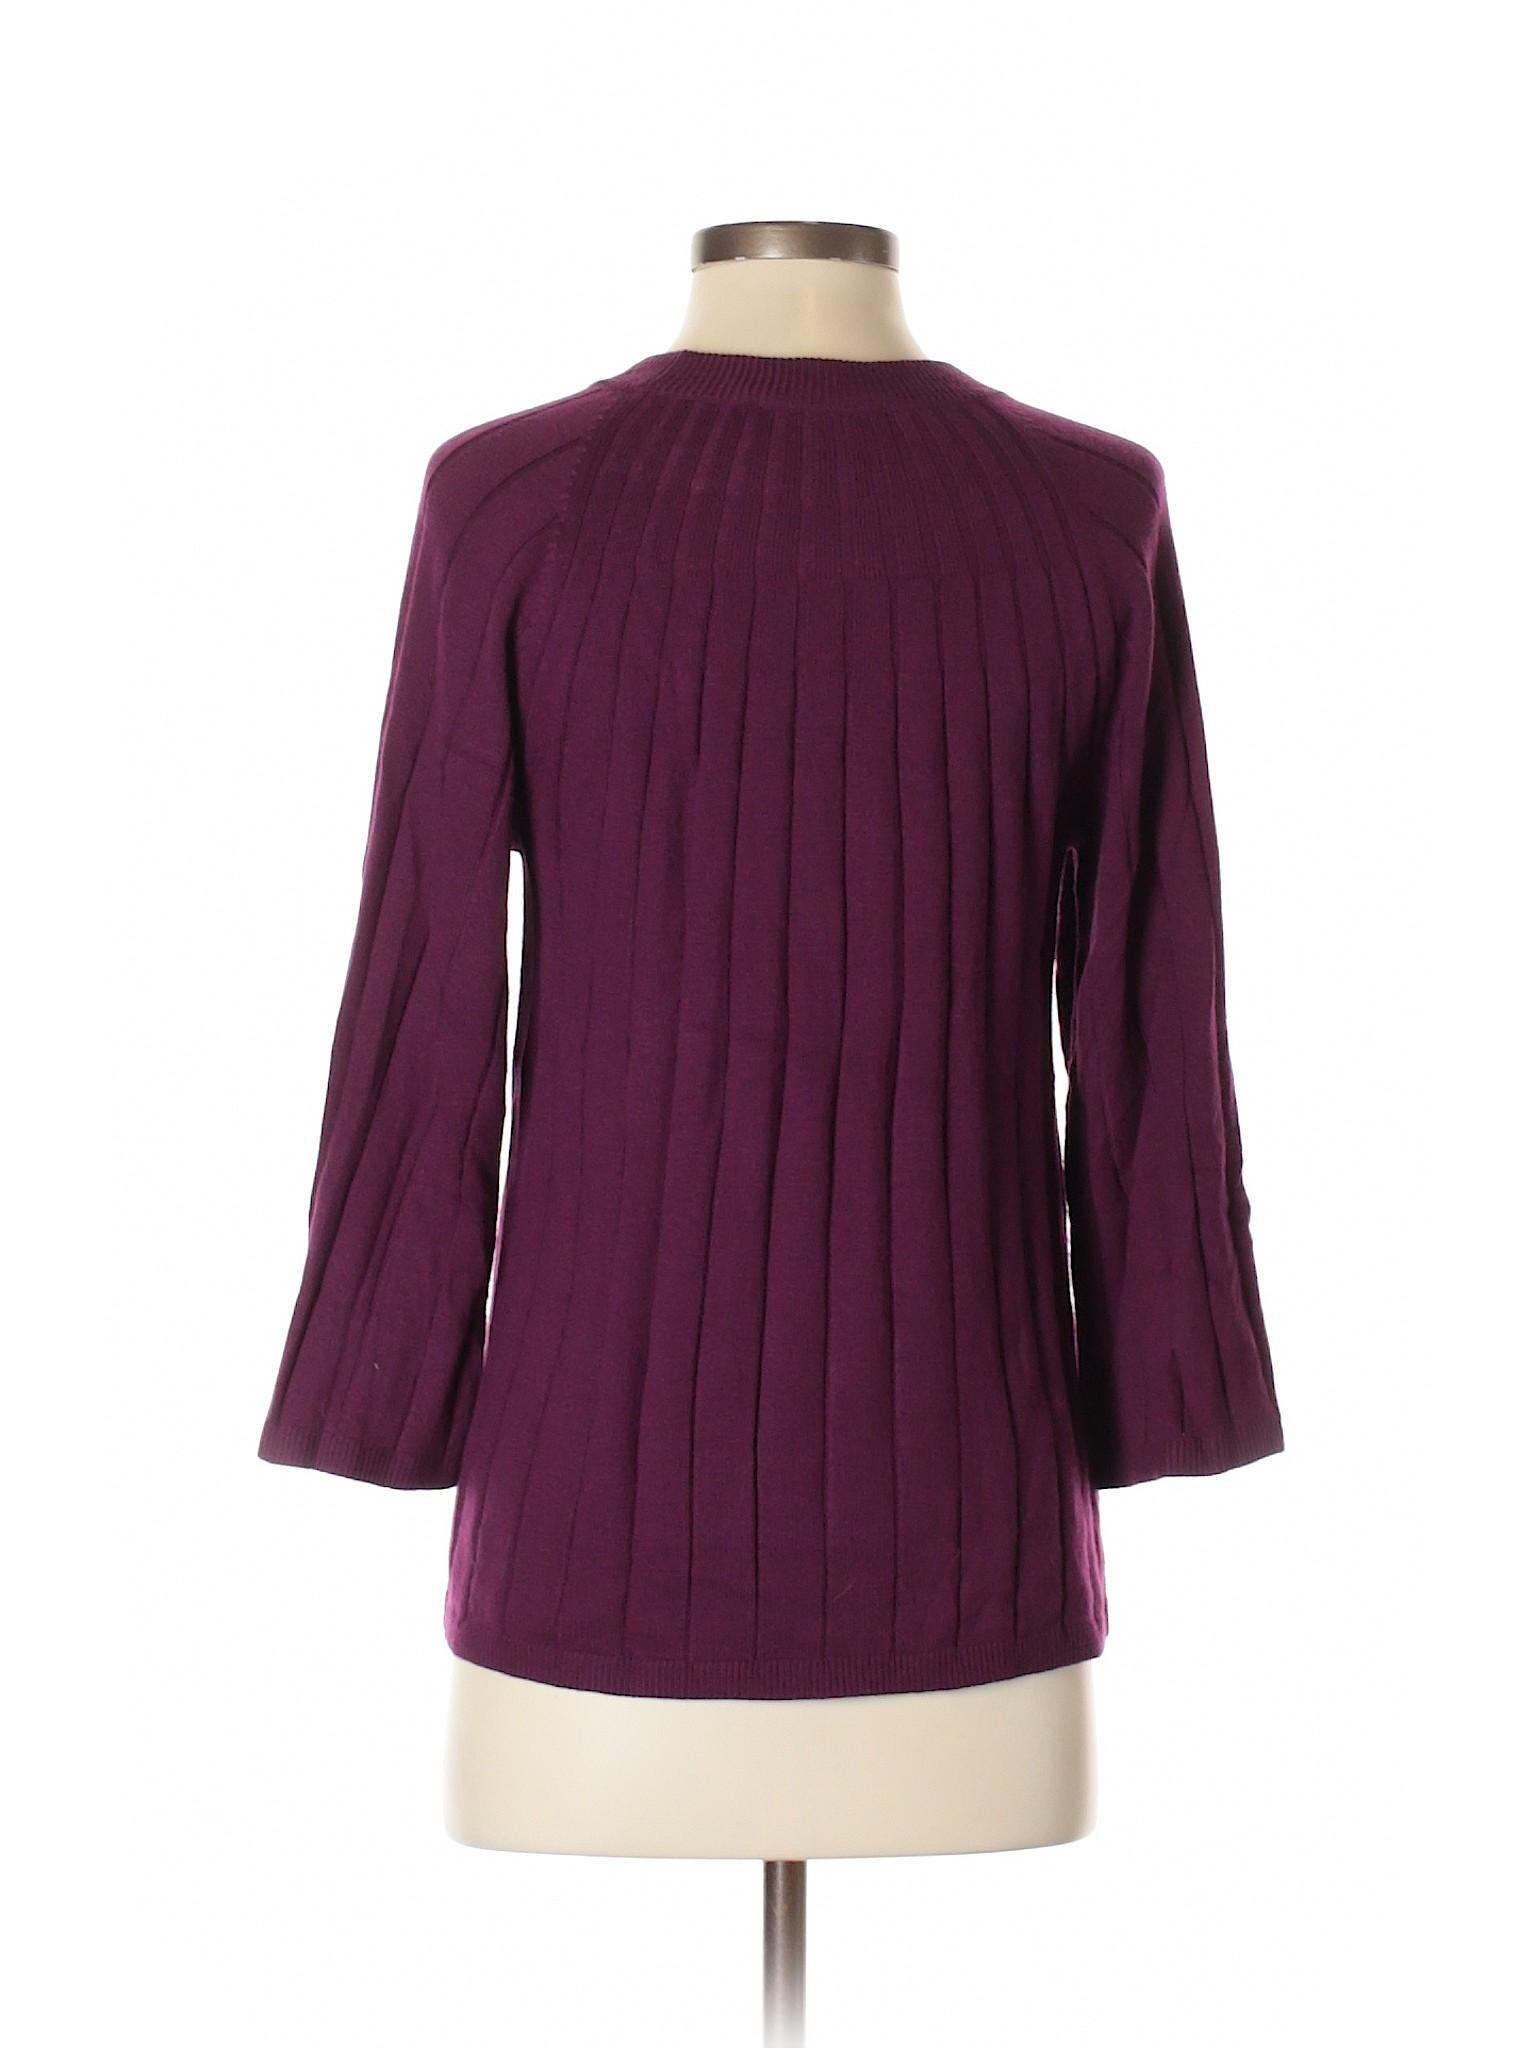 Ann Pullover Boutique Sweater Taylor LOFT FBPw67q